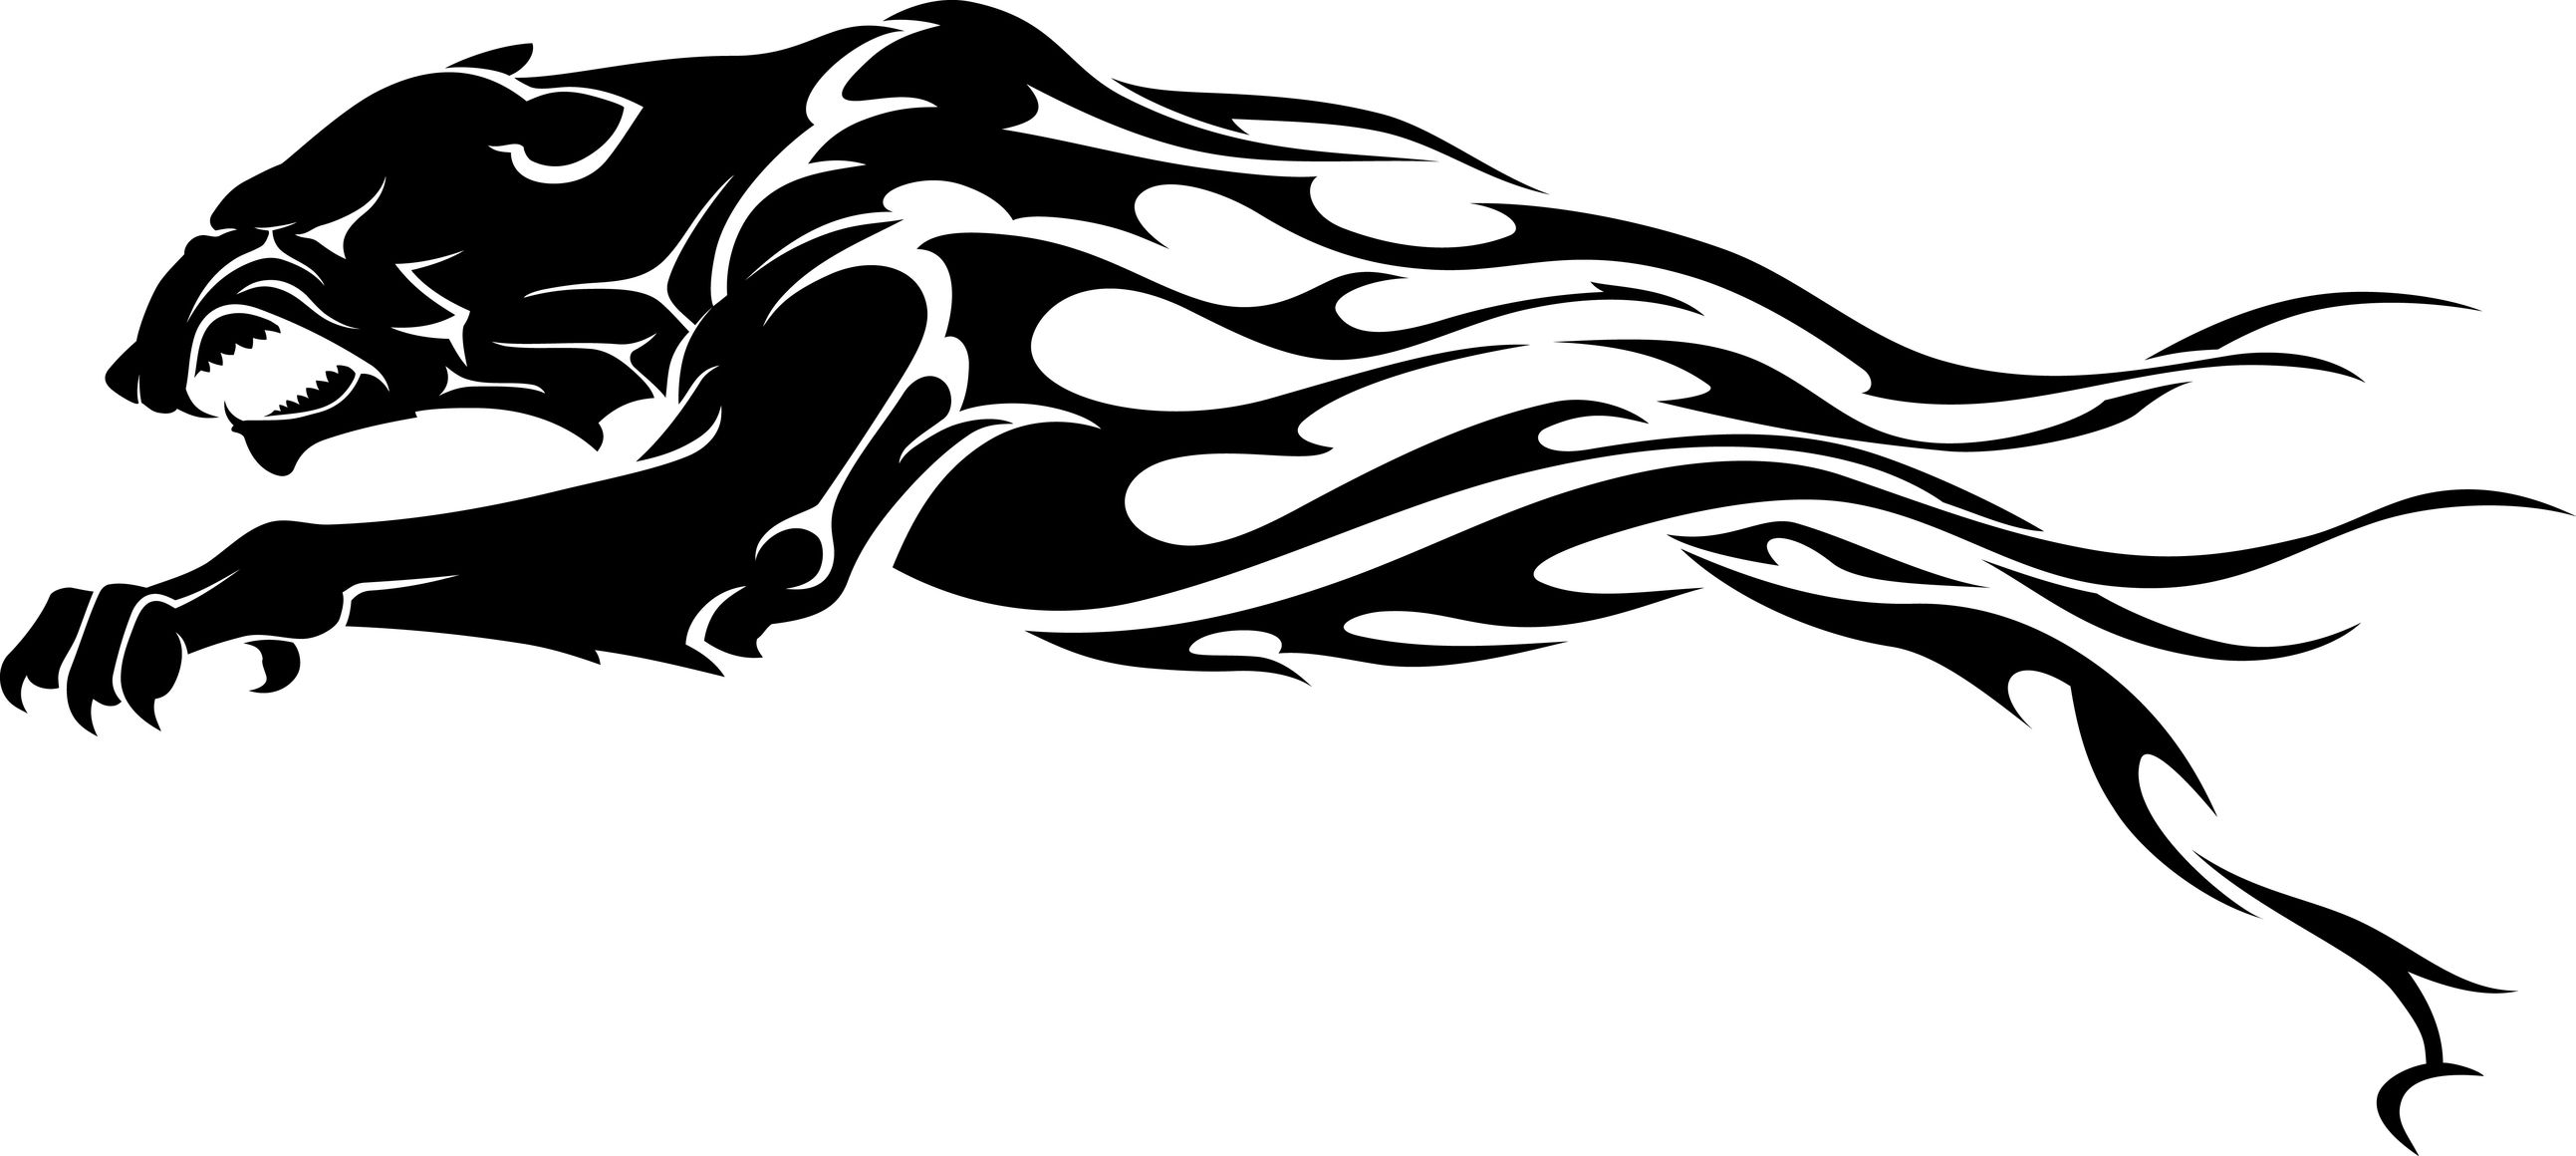 Tribal Black Panther Tattoo Tatuagem Pantera Tatoo Desenhos